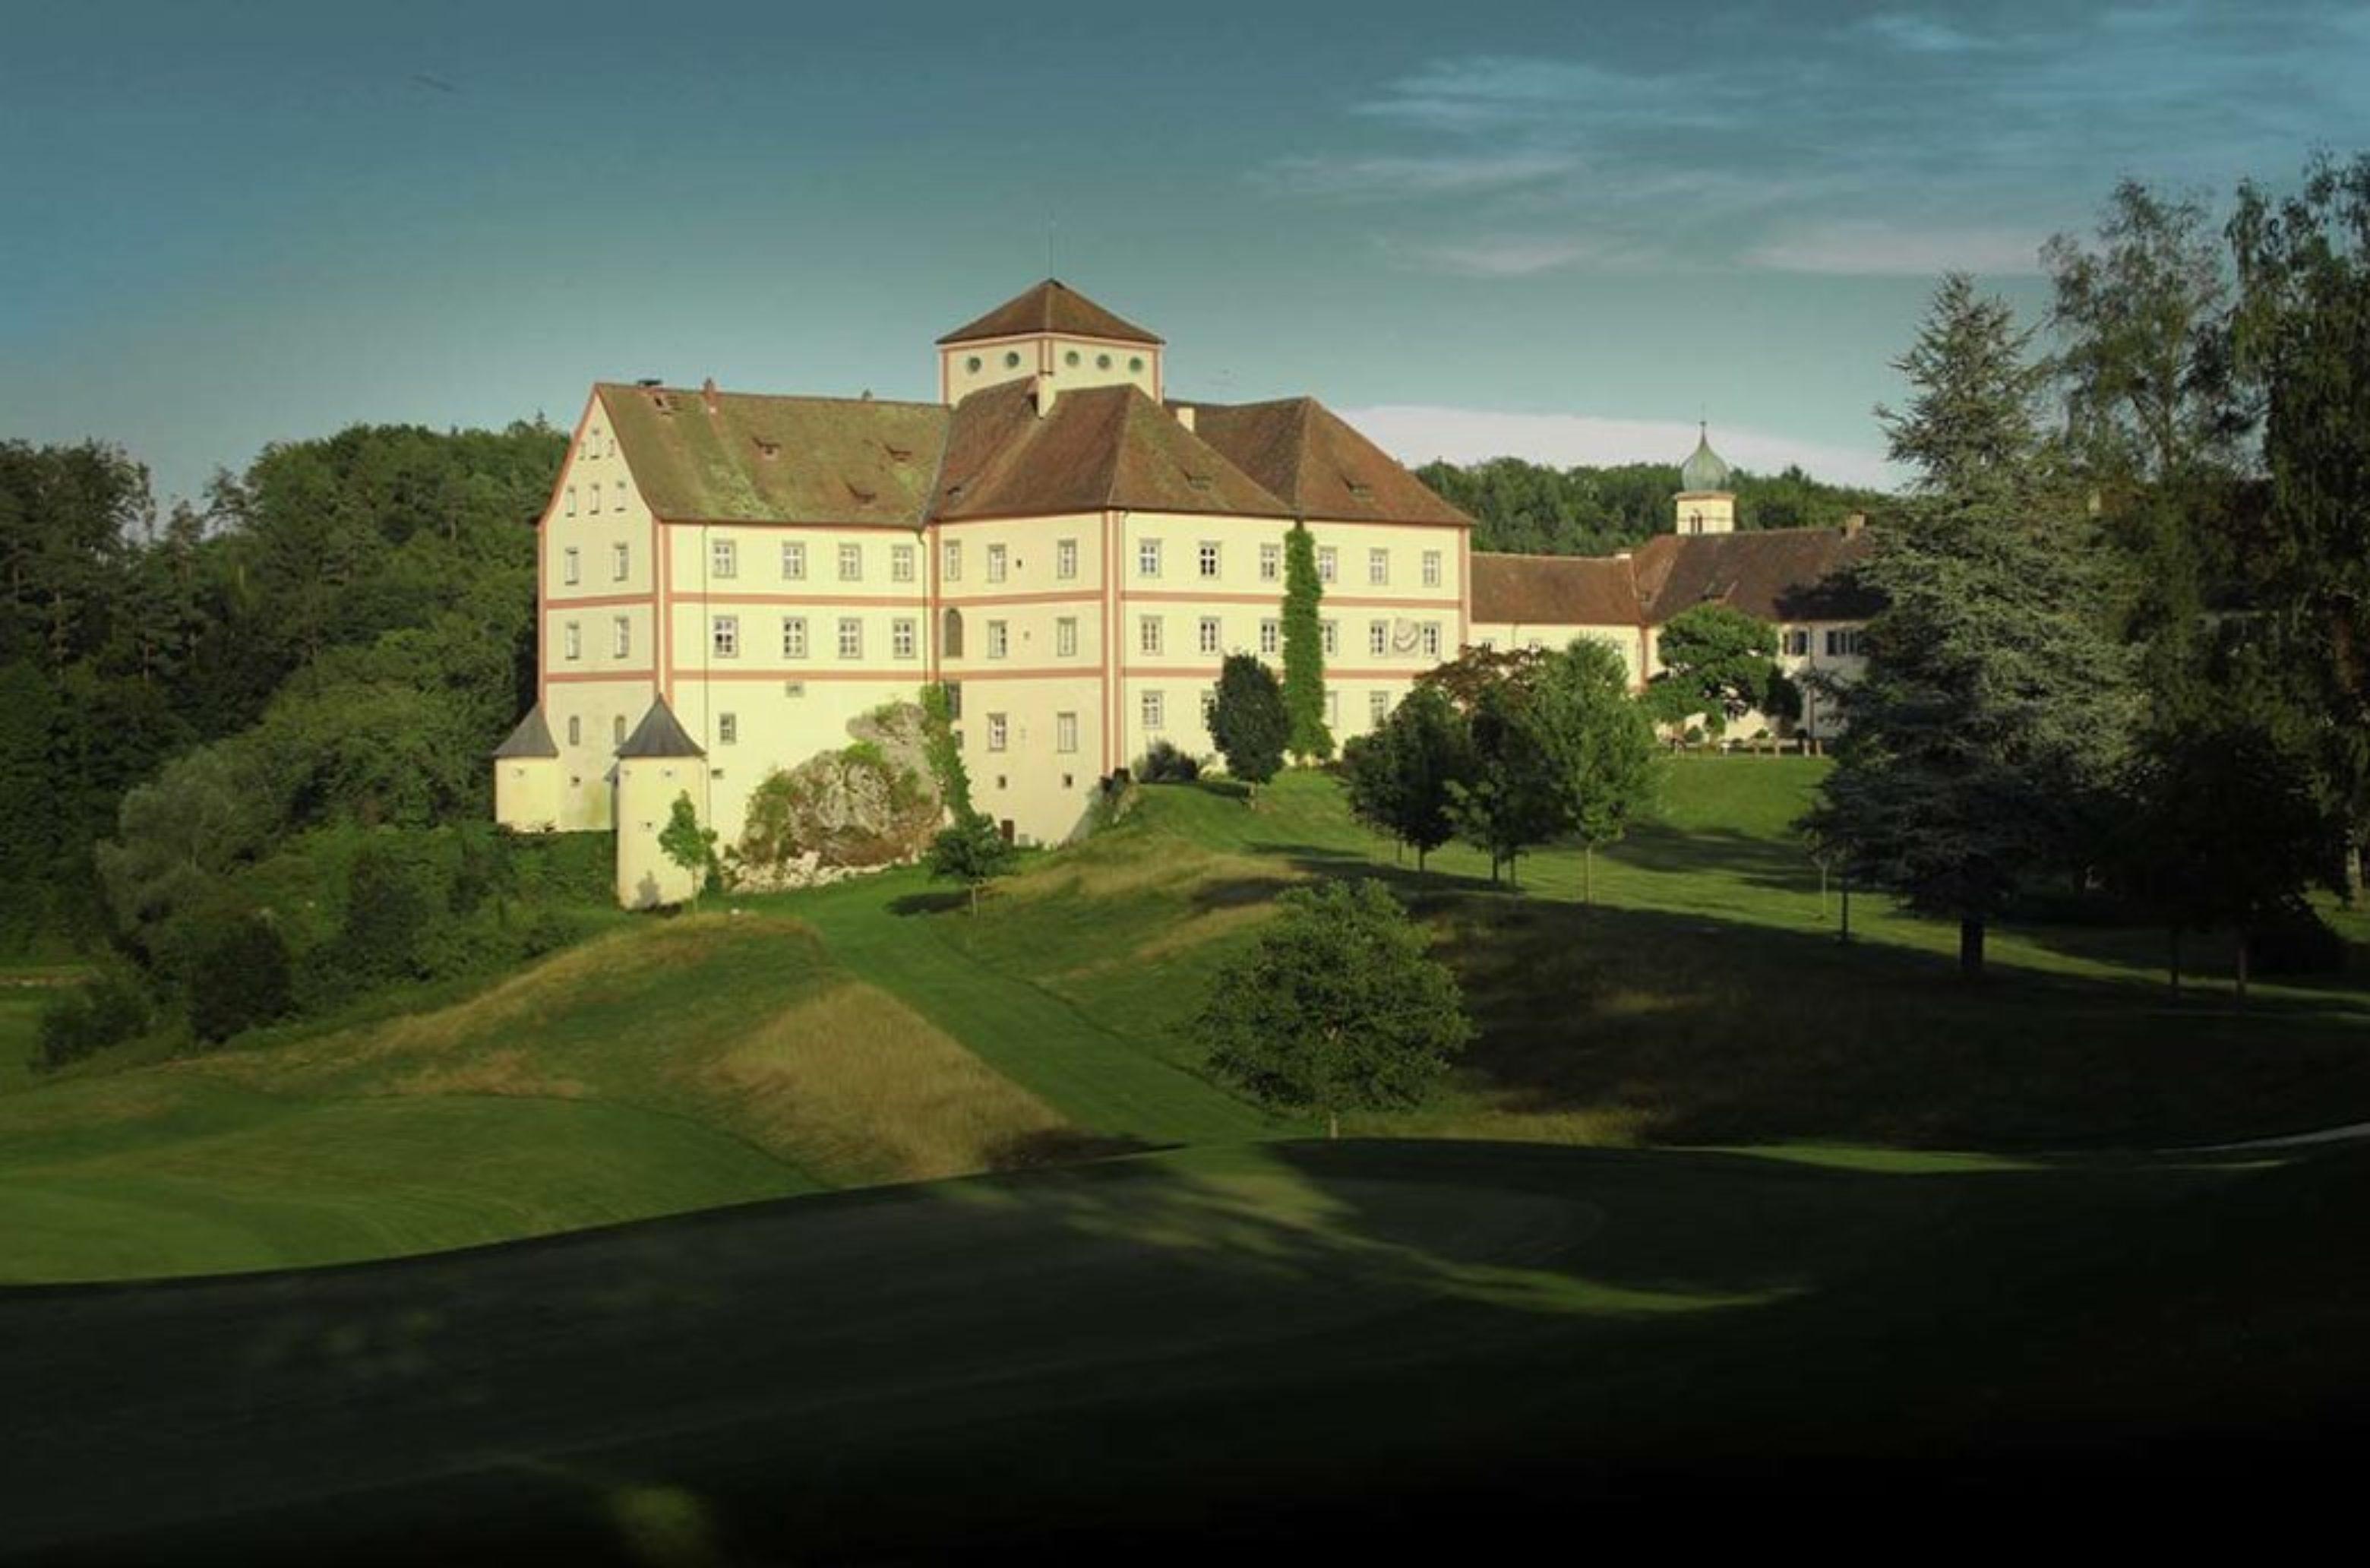 Fasnachtsmuseum in the Schloss Langenstein bei Orsingen-Nenzingen